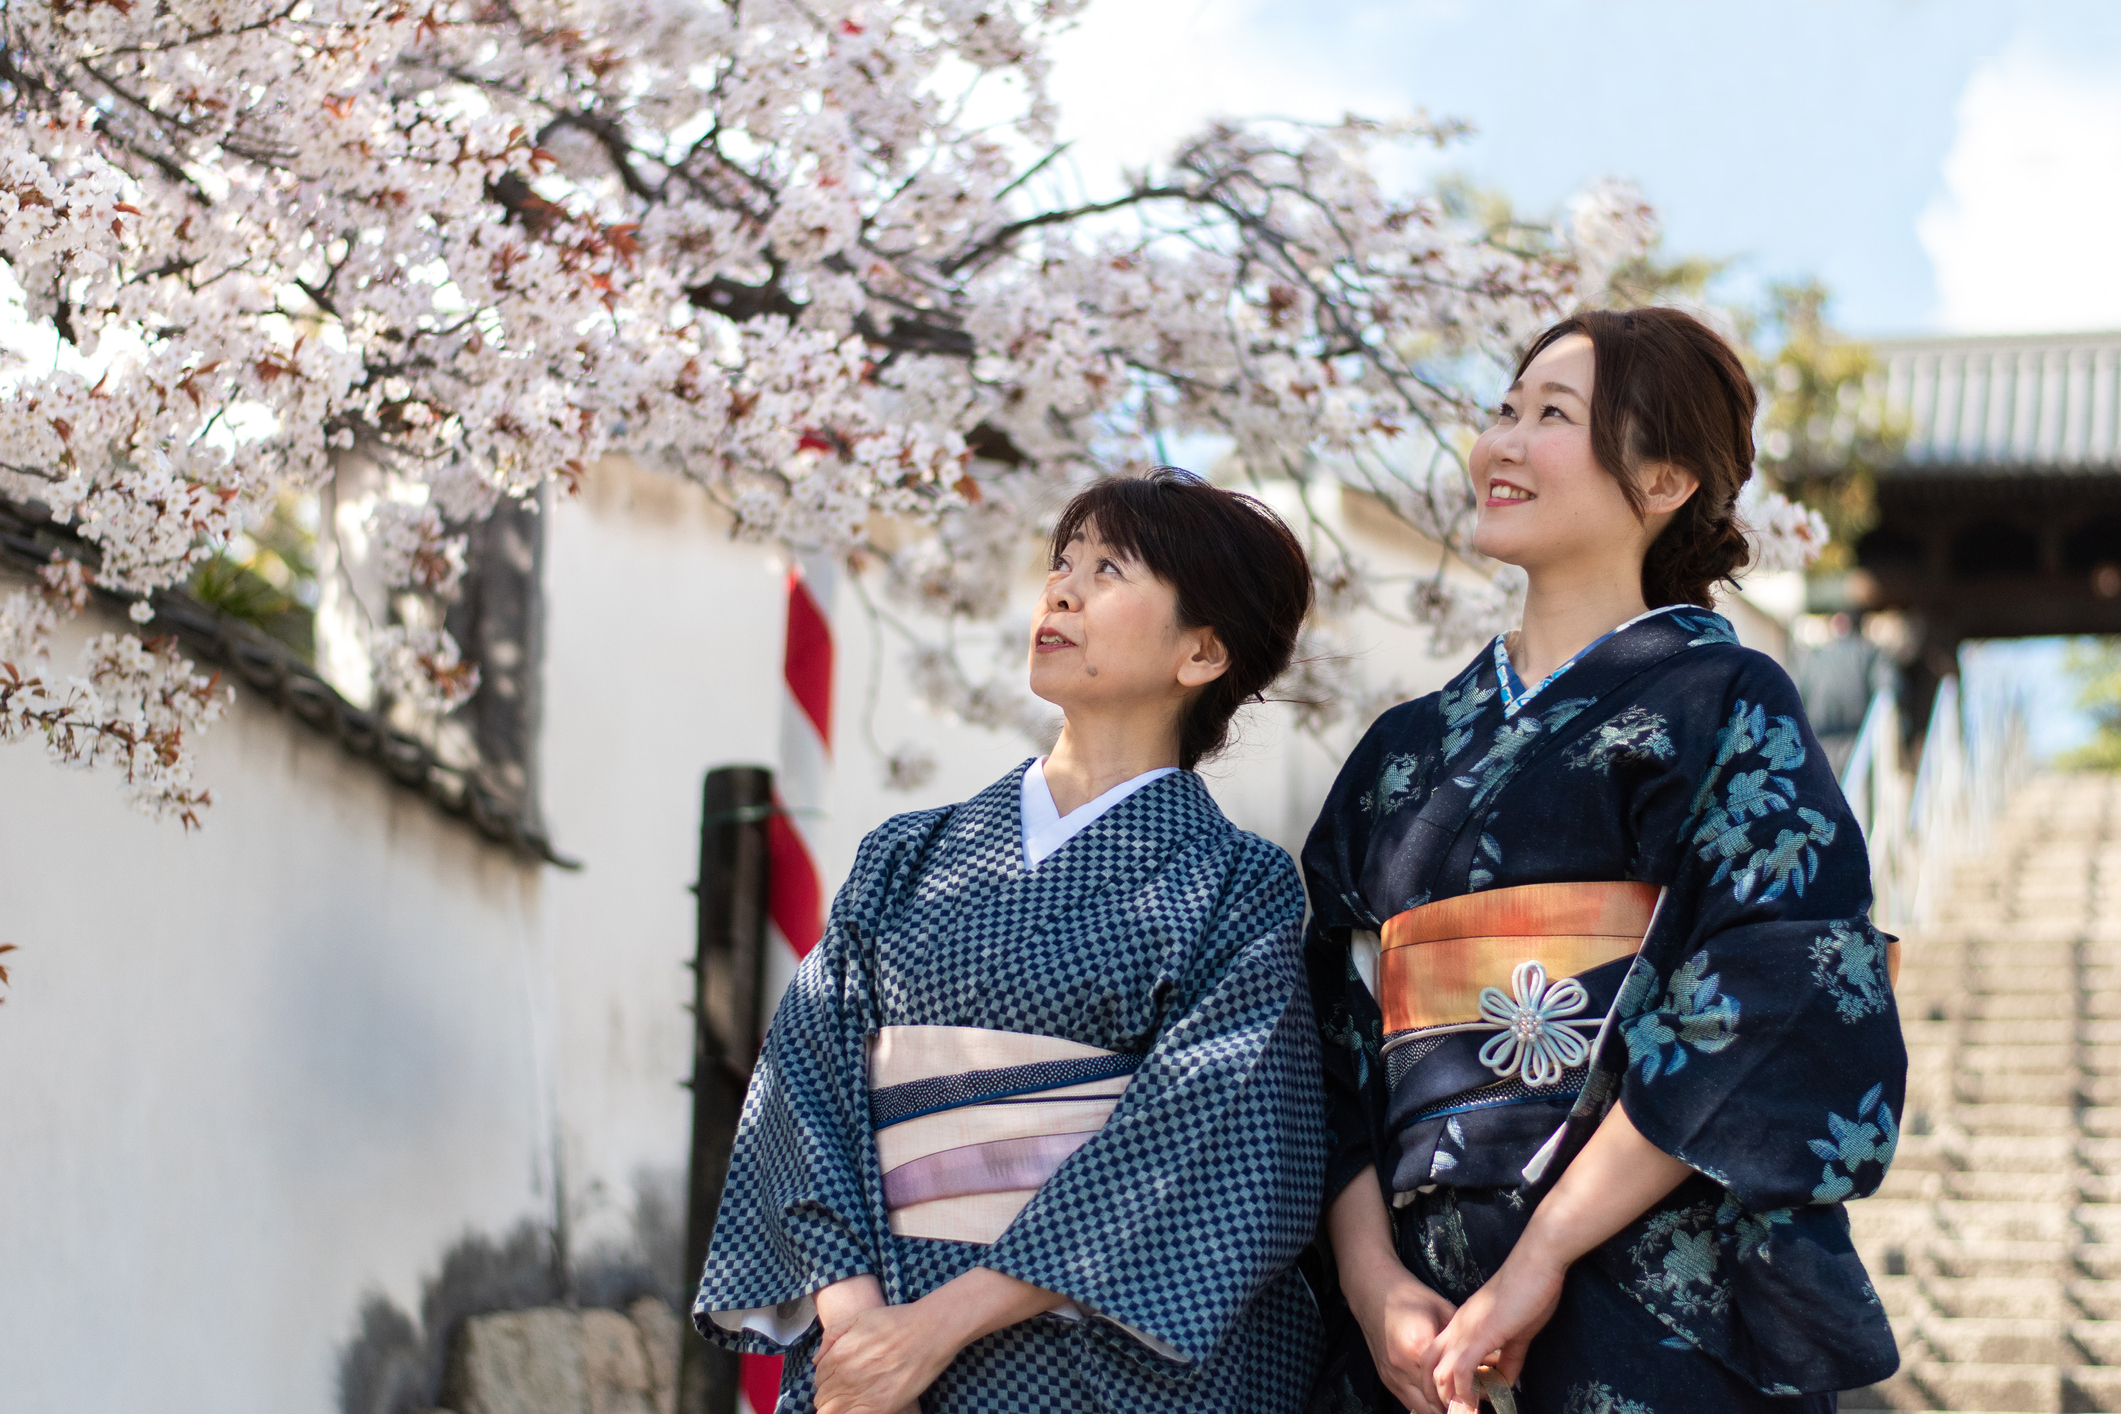 Japanese ladies wearing traditional kimonos with indigo ichimatsu pattern